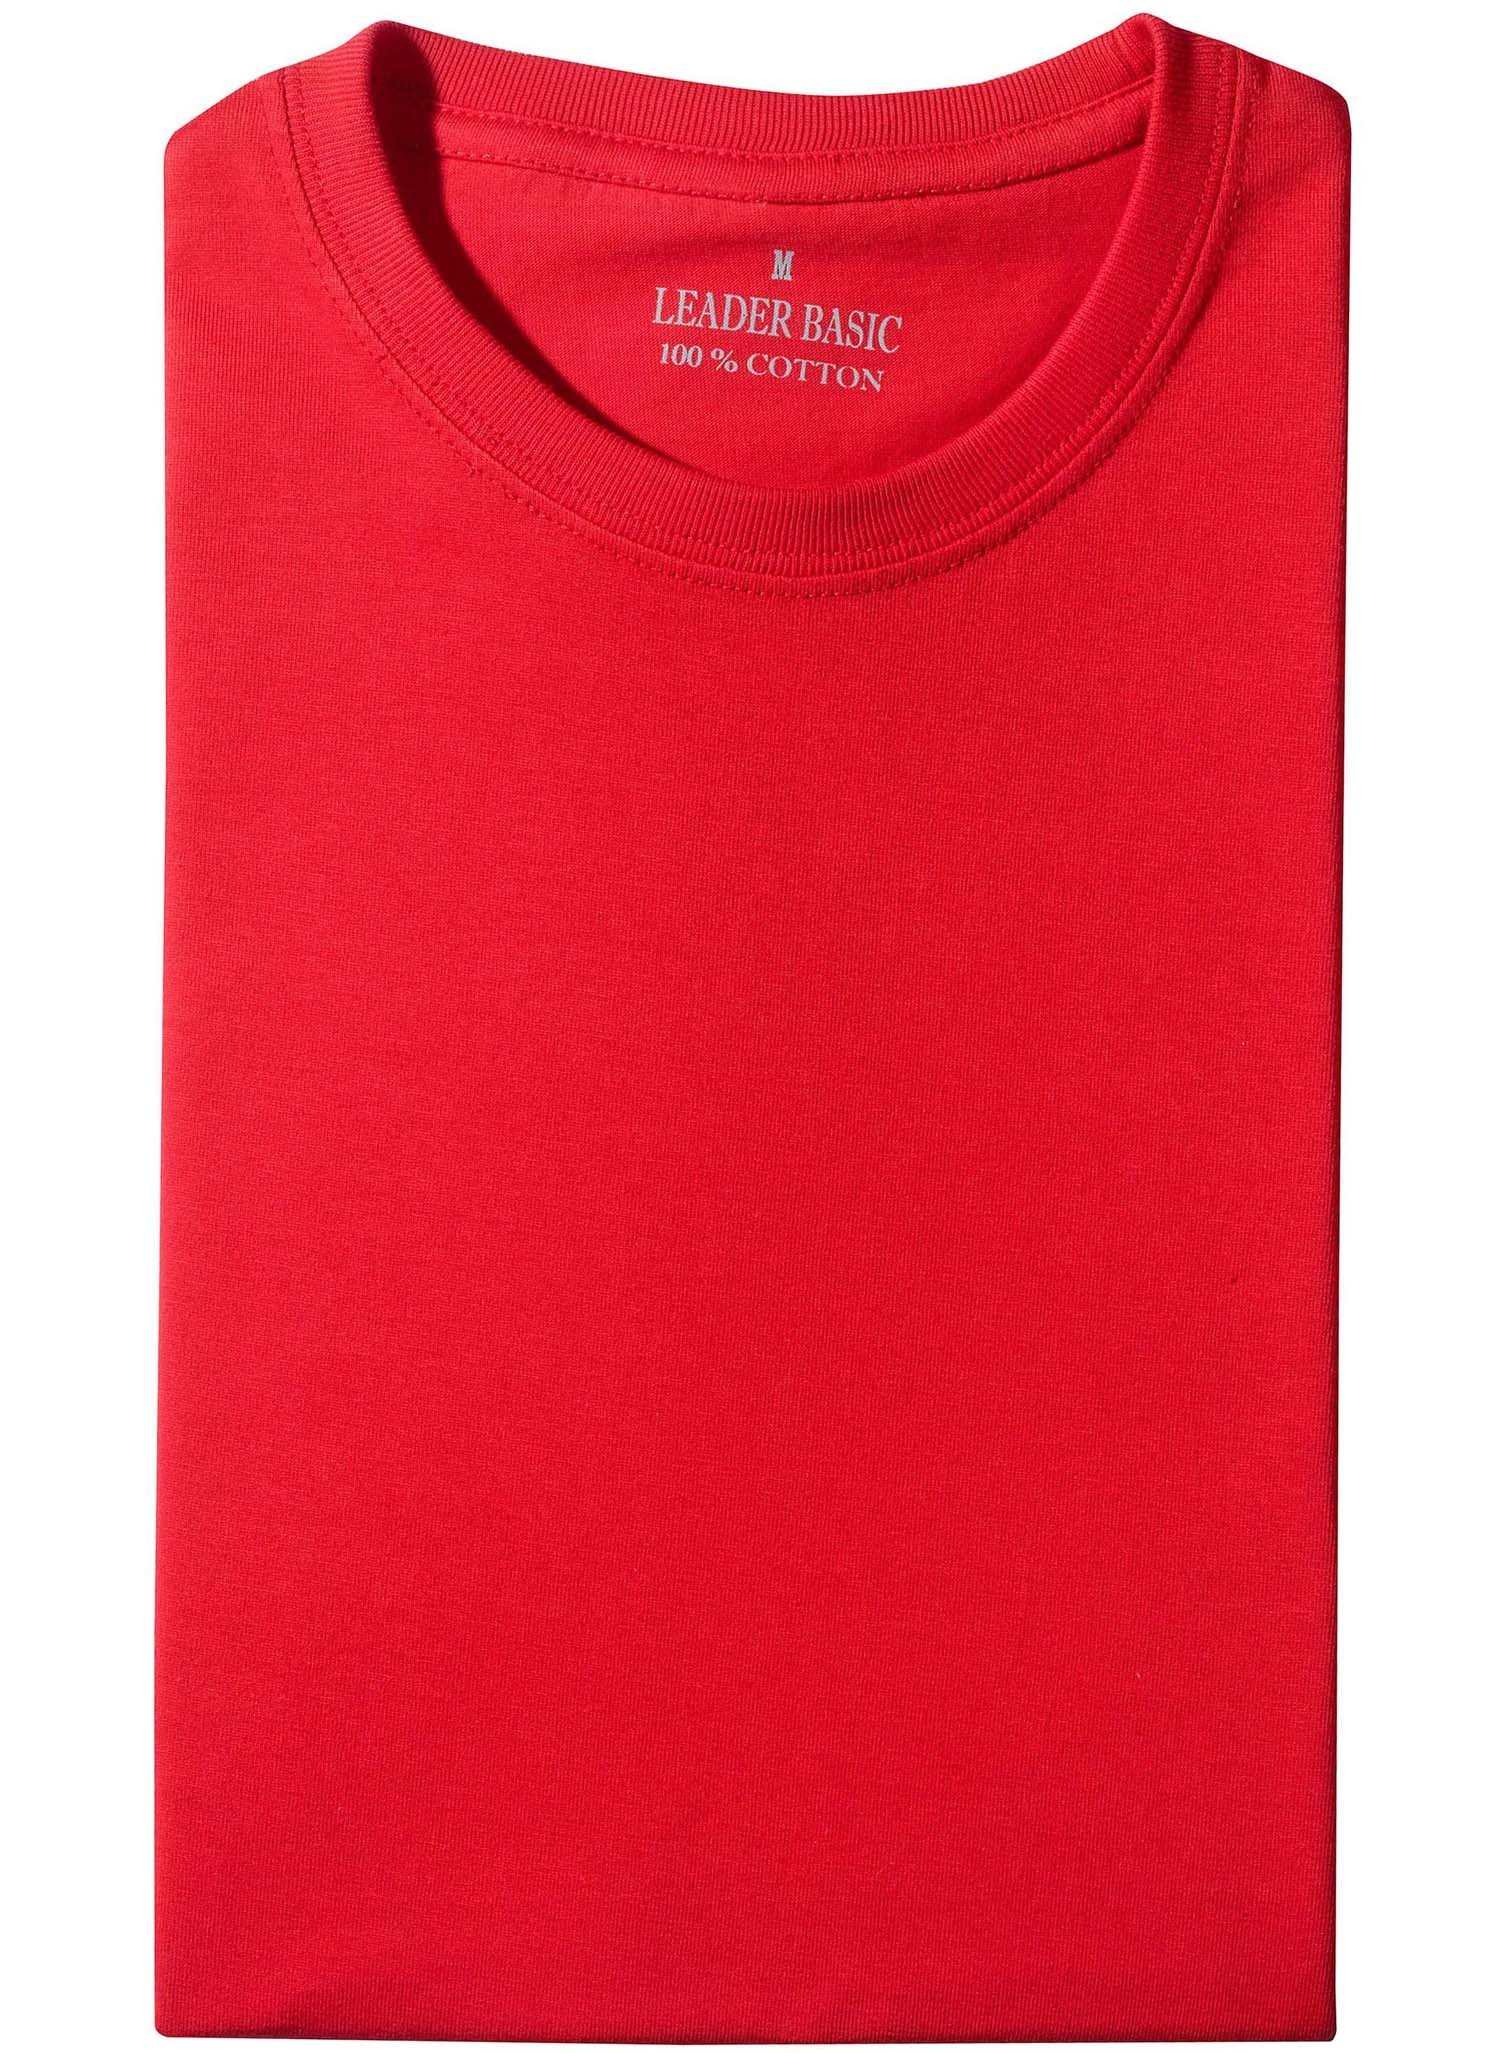 U-Duo-Pack-Shirt rot XXXL 023 - 1 - Ronja.ch